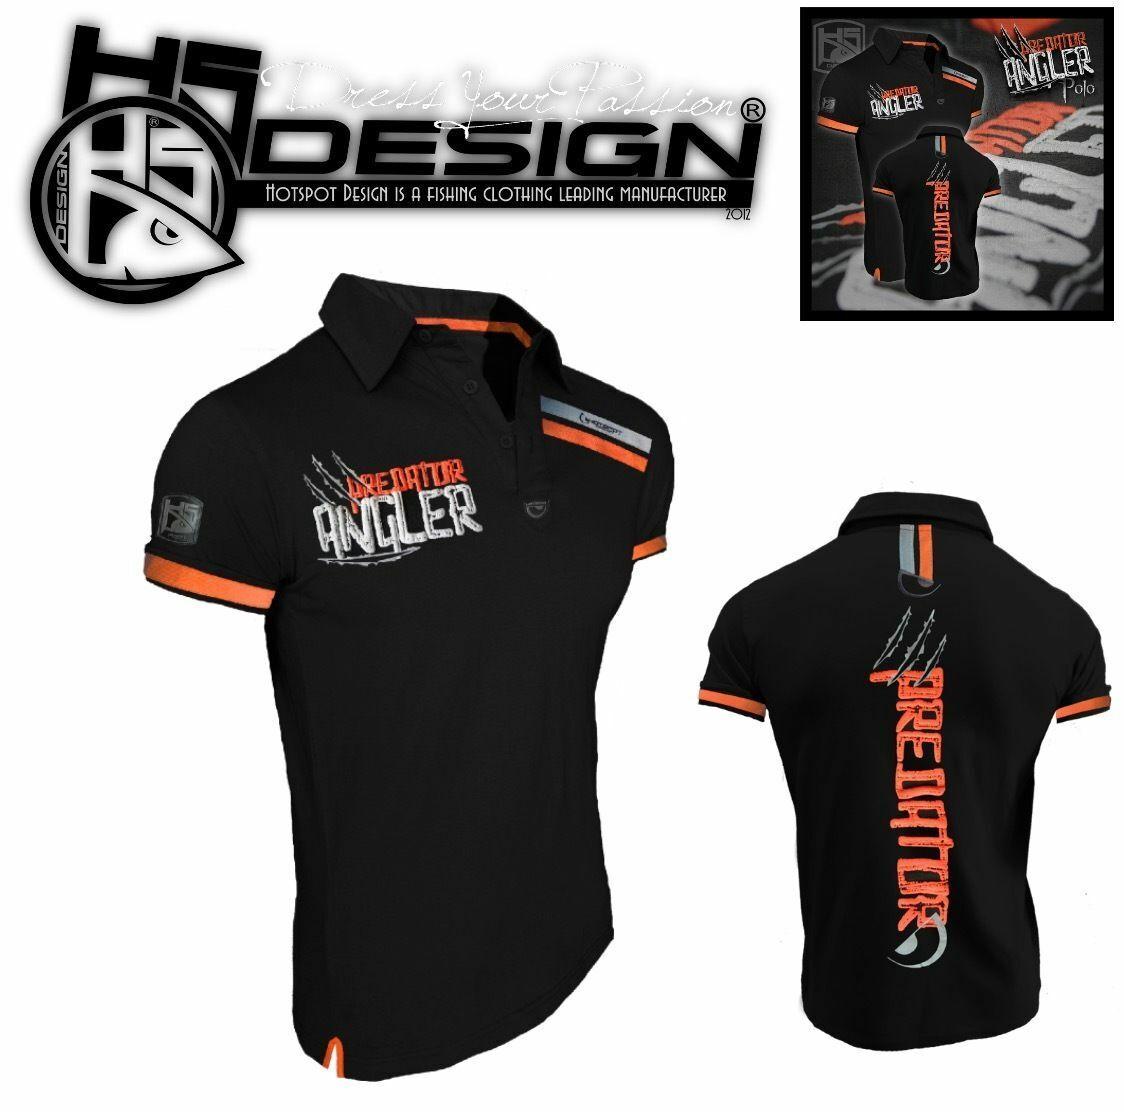 HOT SPOT DESIGN POLO T-Shirt PREDATOR ANGLER